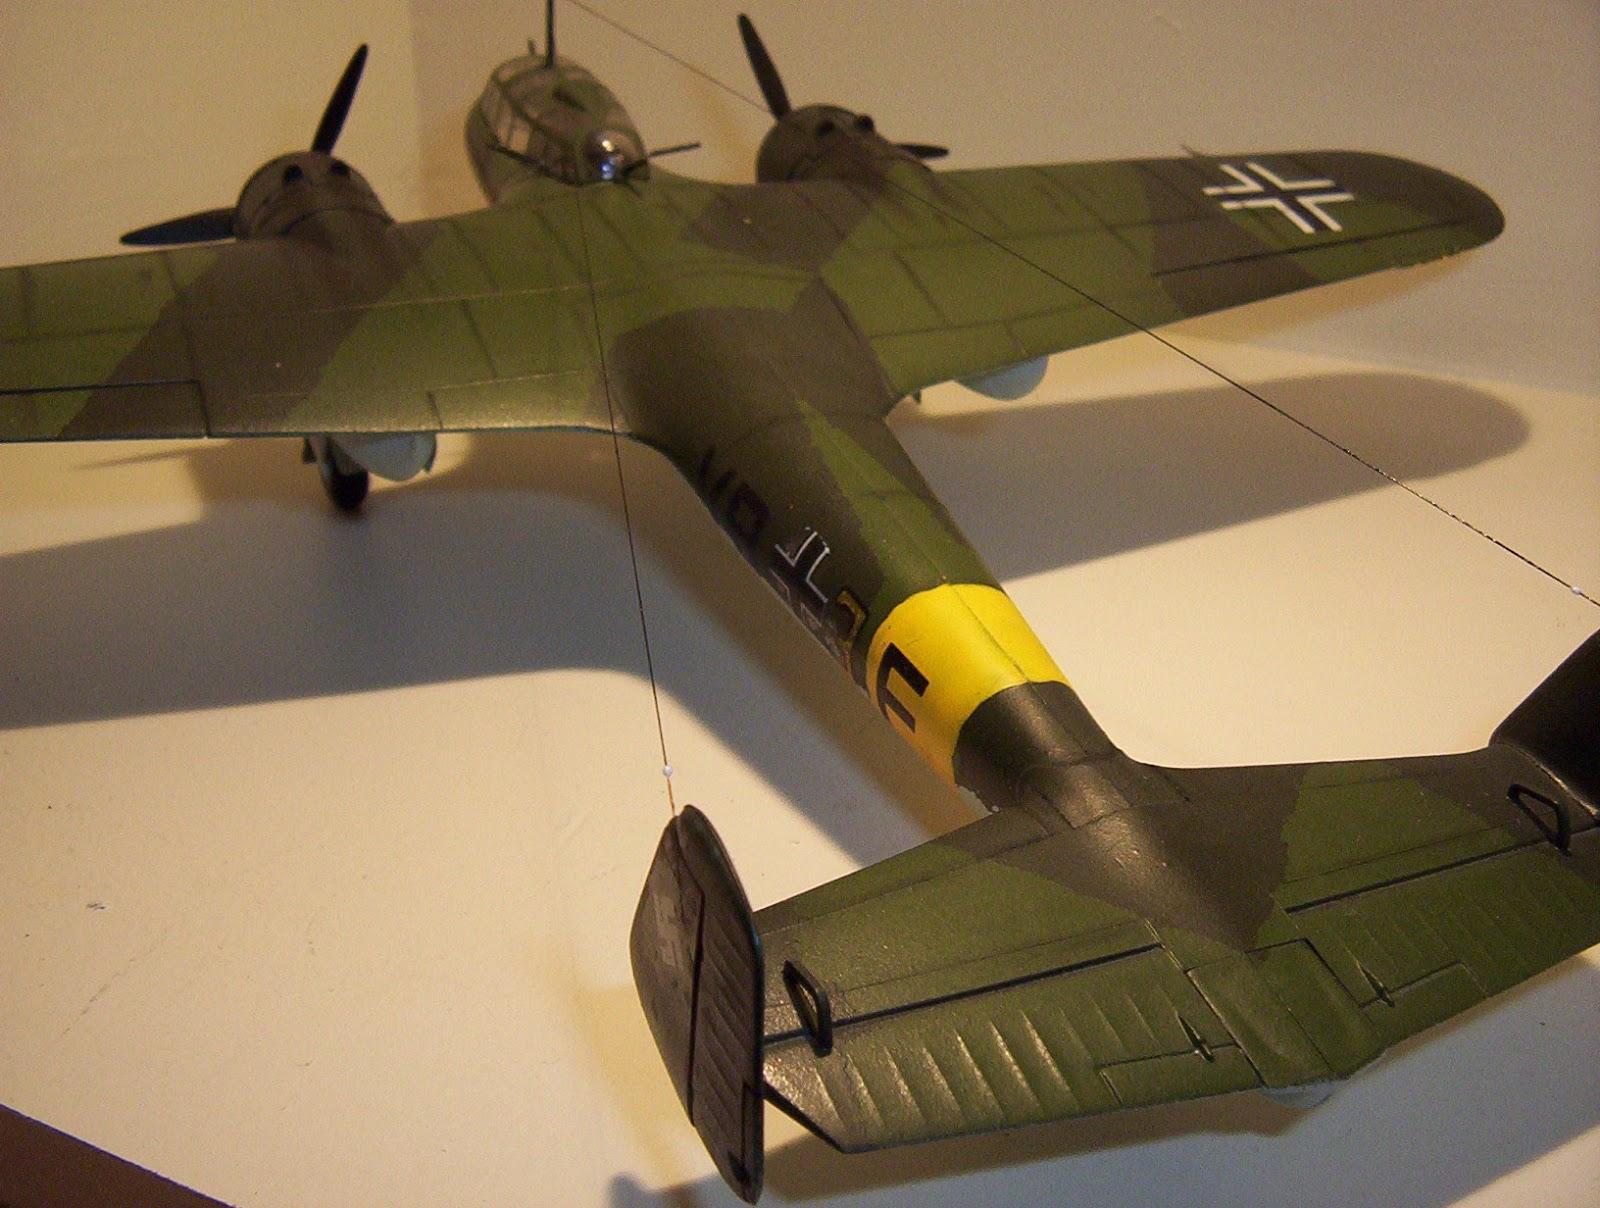 Scale Model Hobby Dornier Do17z The Flying Pencil 1 72 Scale